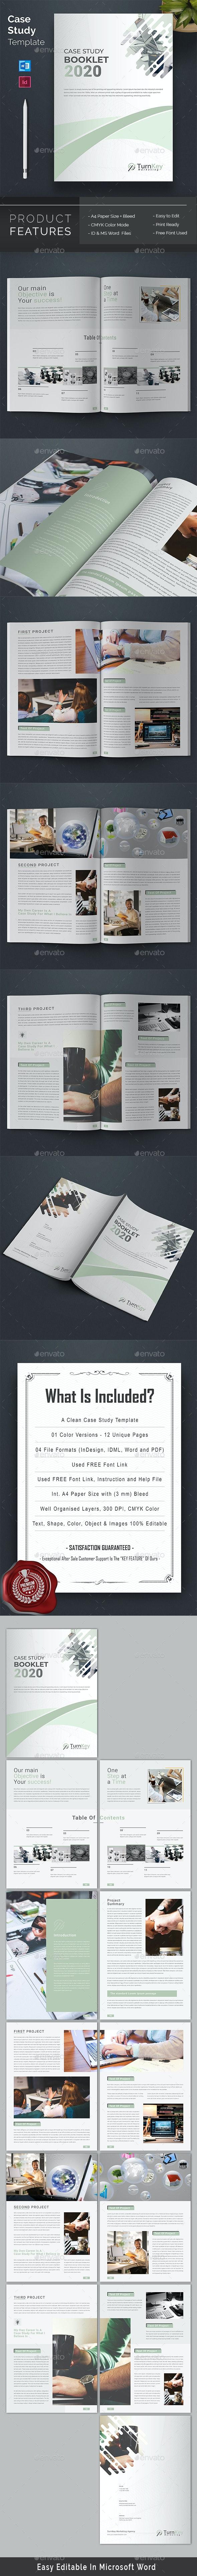 Case Study Booklet - Brochures Print Templates